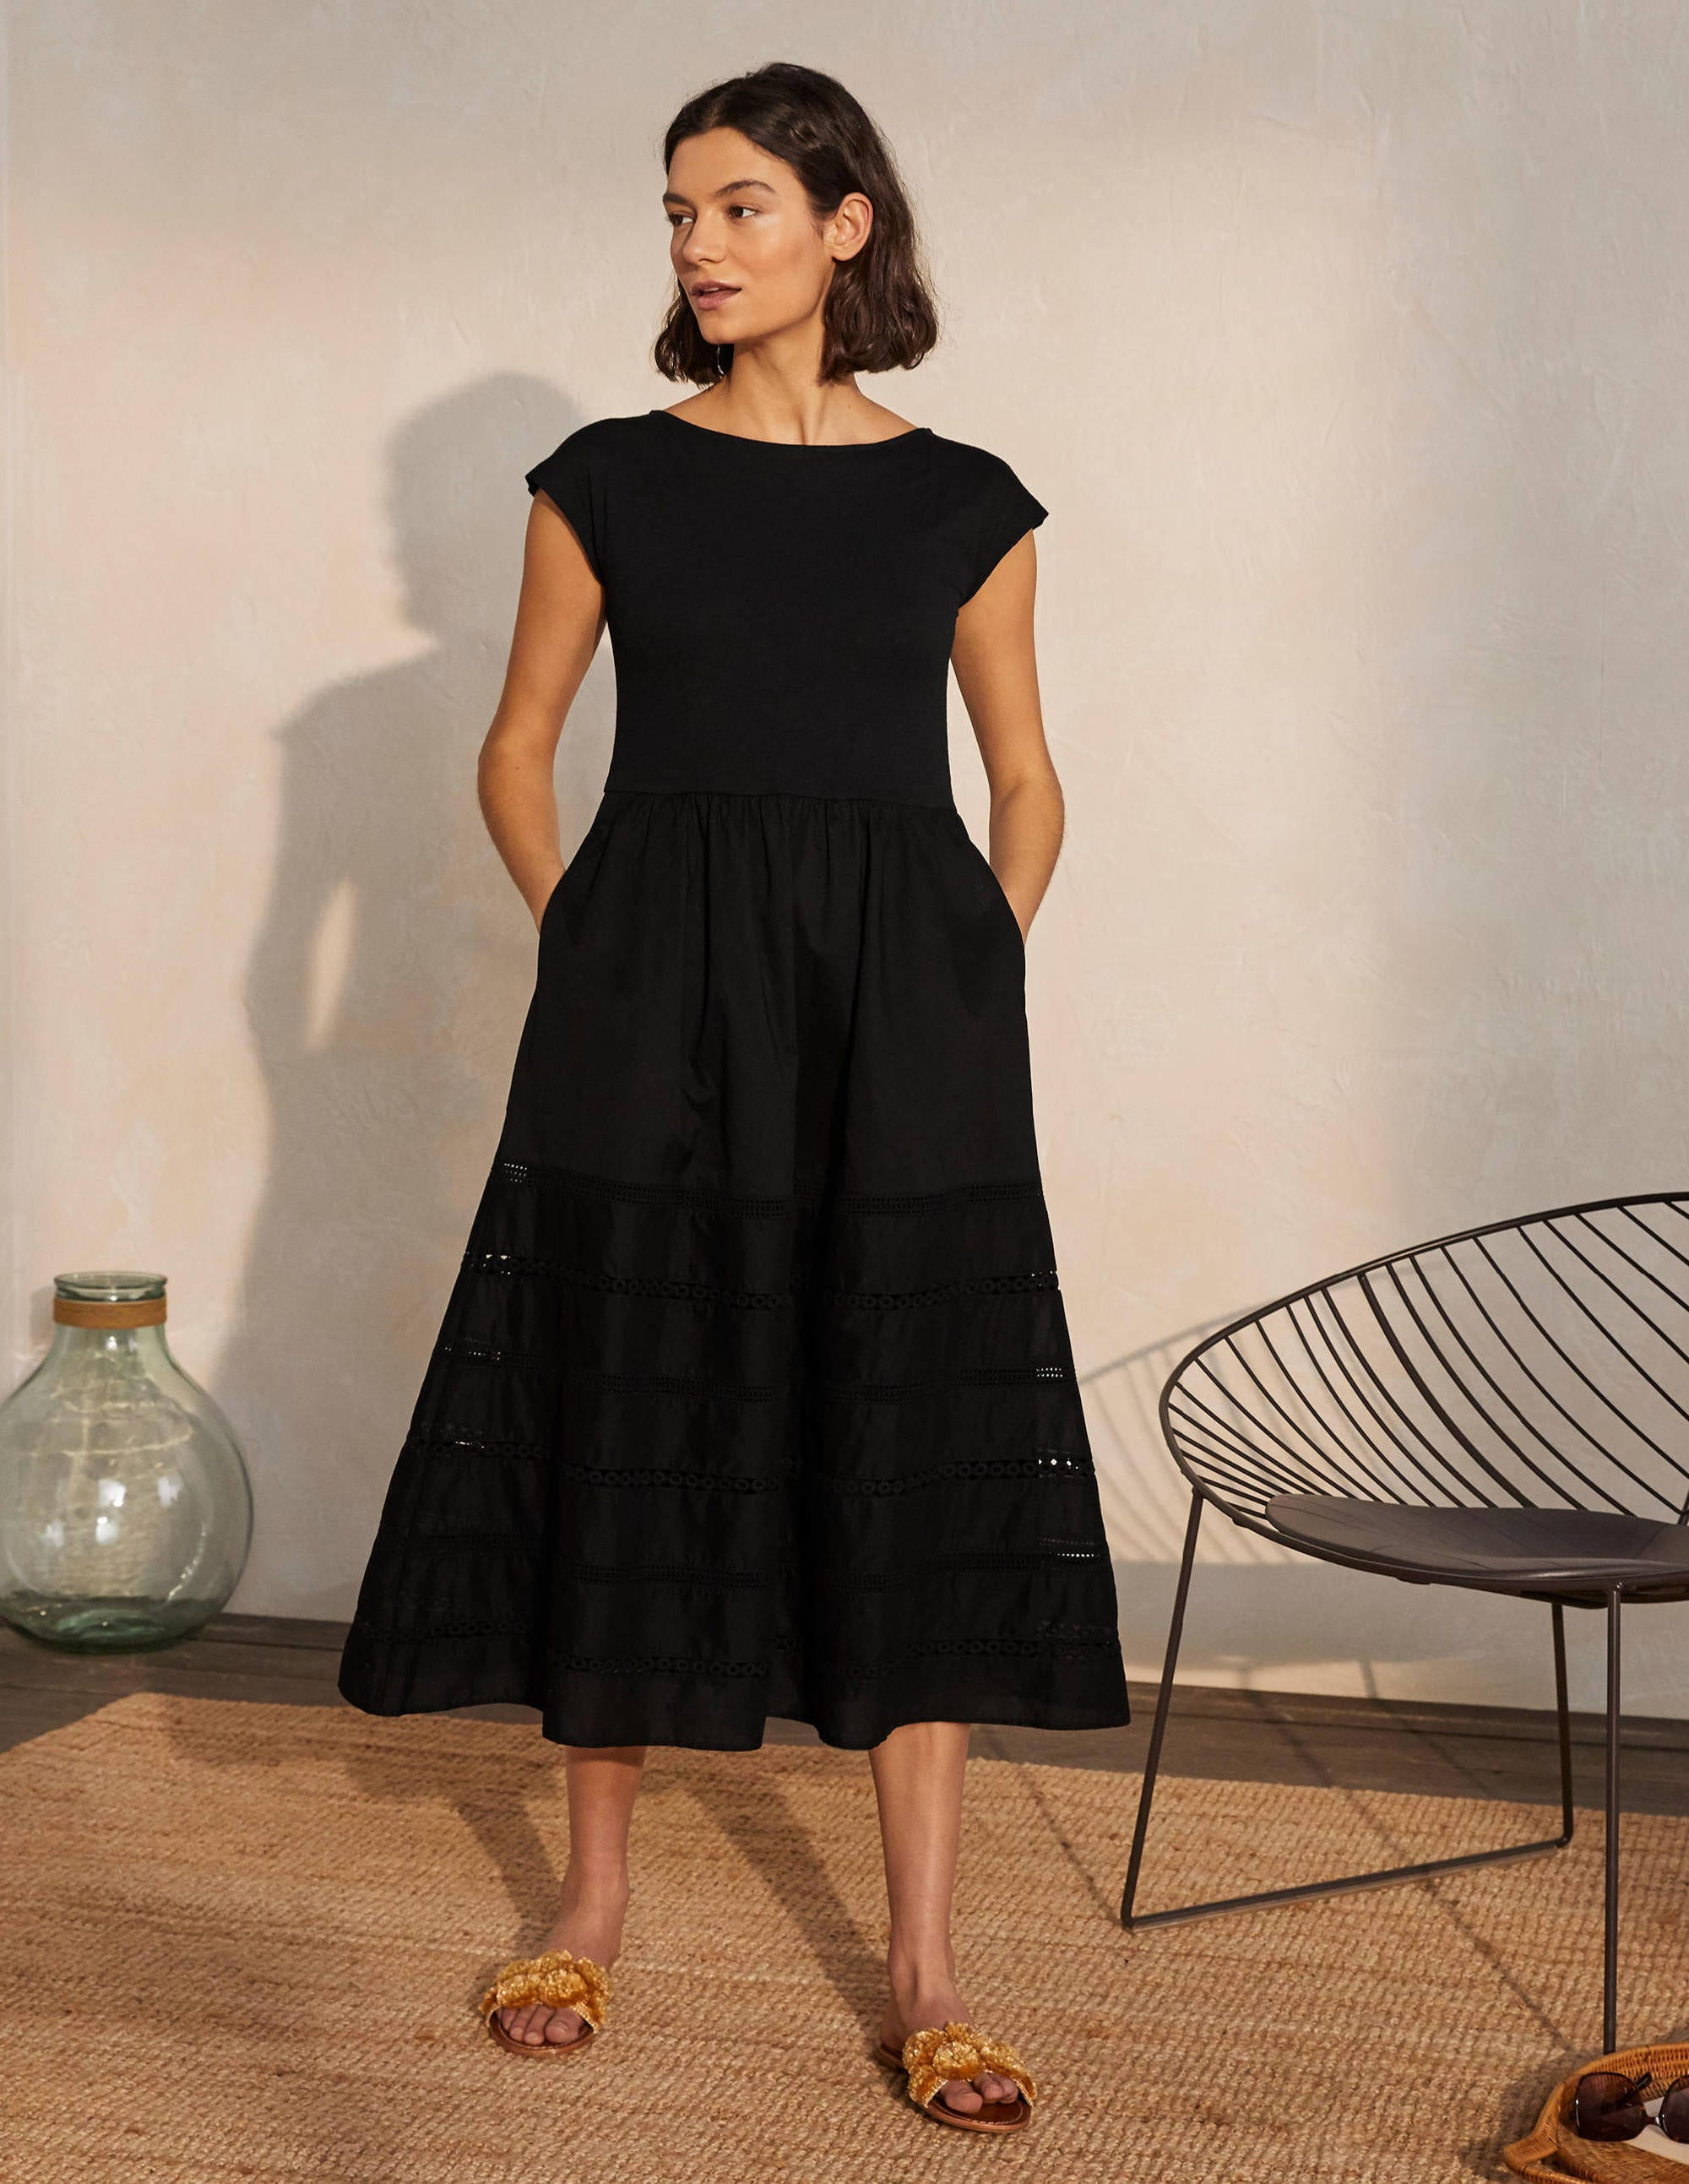 Boden Woven Mix Trim Detail Dress - Black